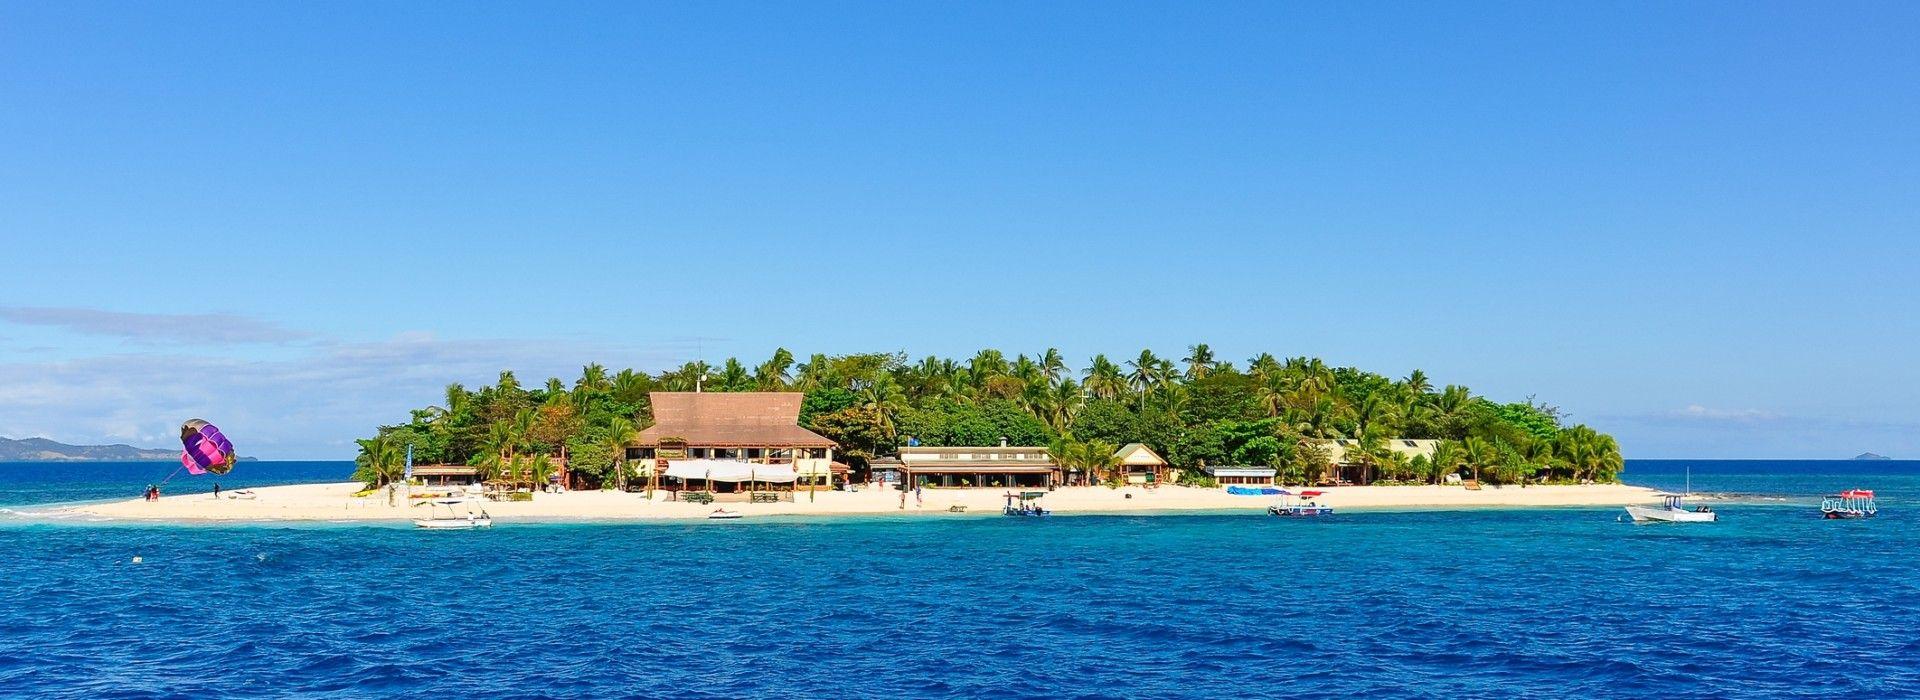 Natural landmarks sightseeing Tours in Oceania